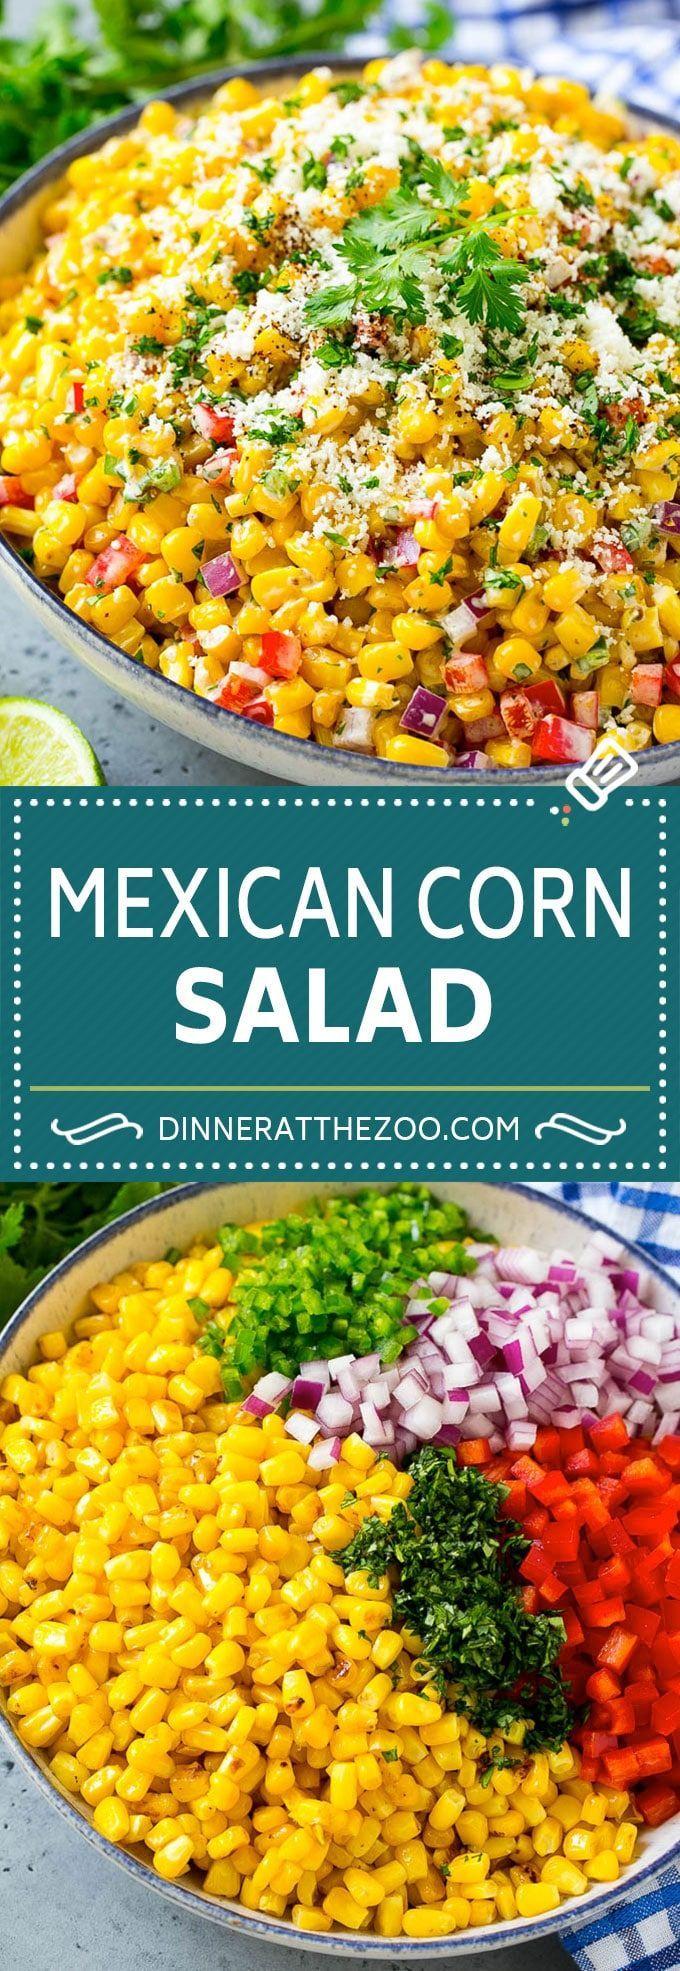 Mexican Corn Salad Recipe | Corn Salad Recipe | Mexican Street Corn